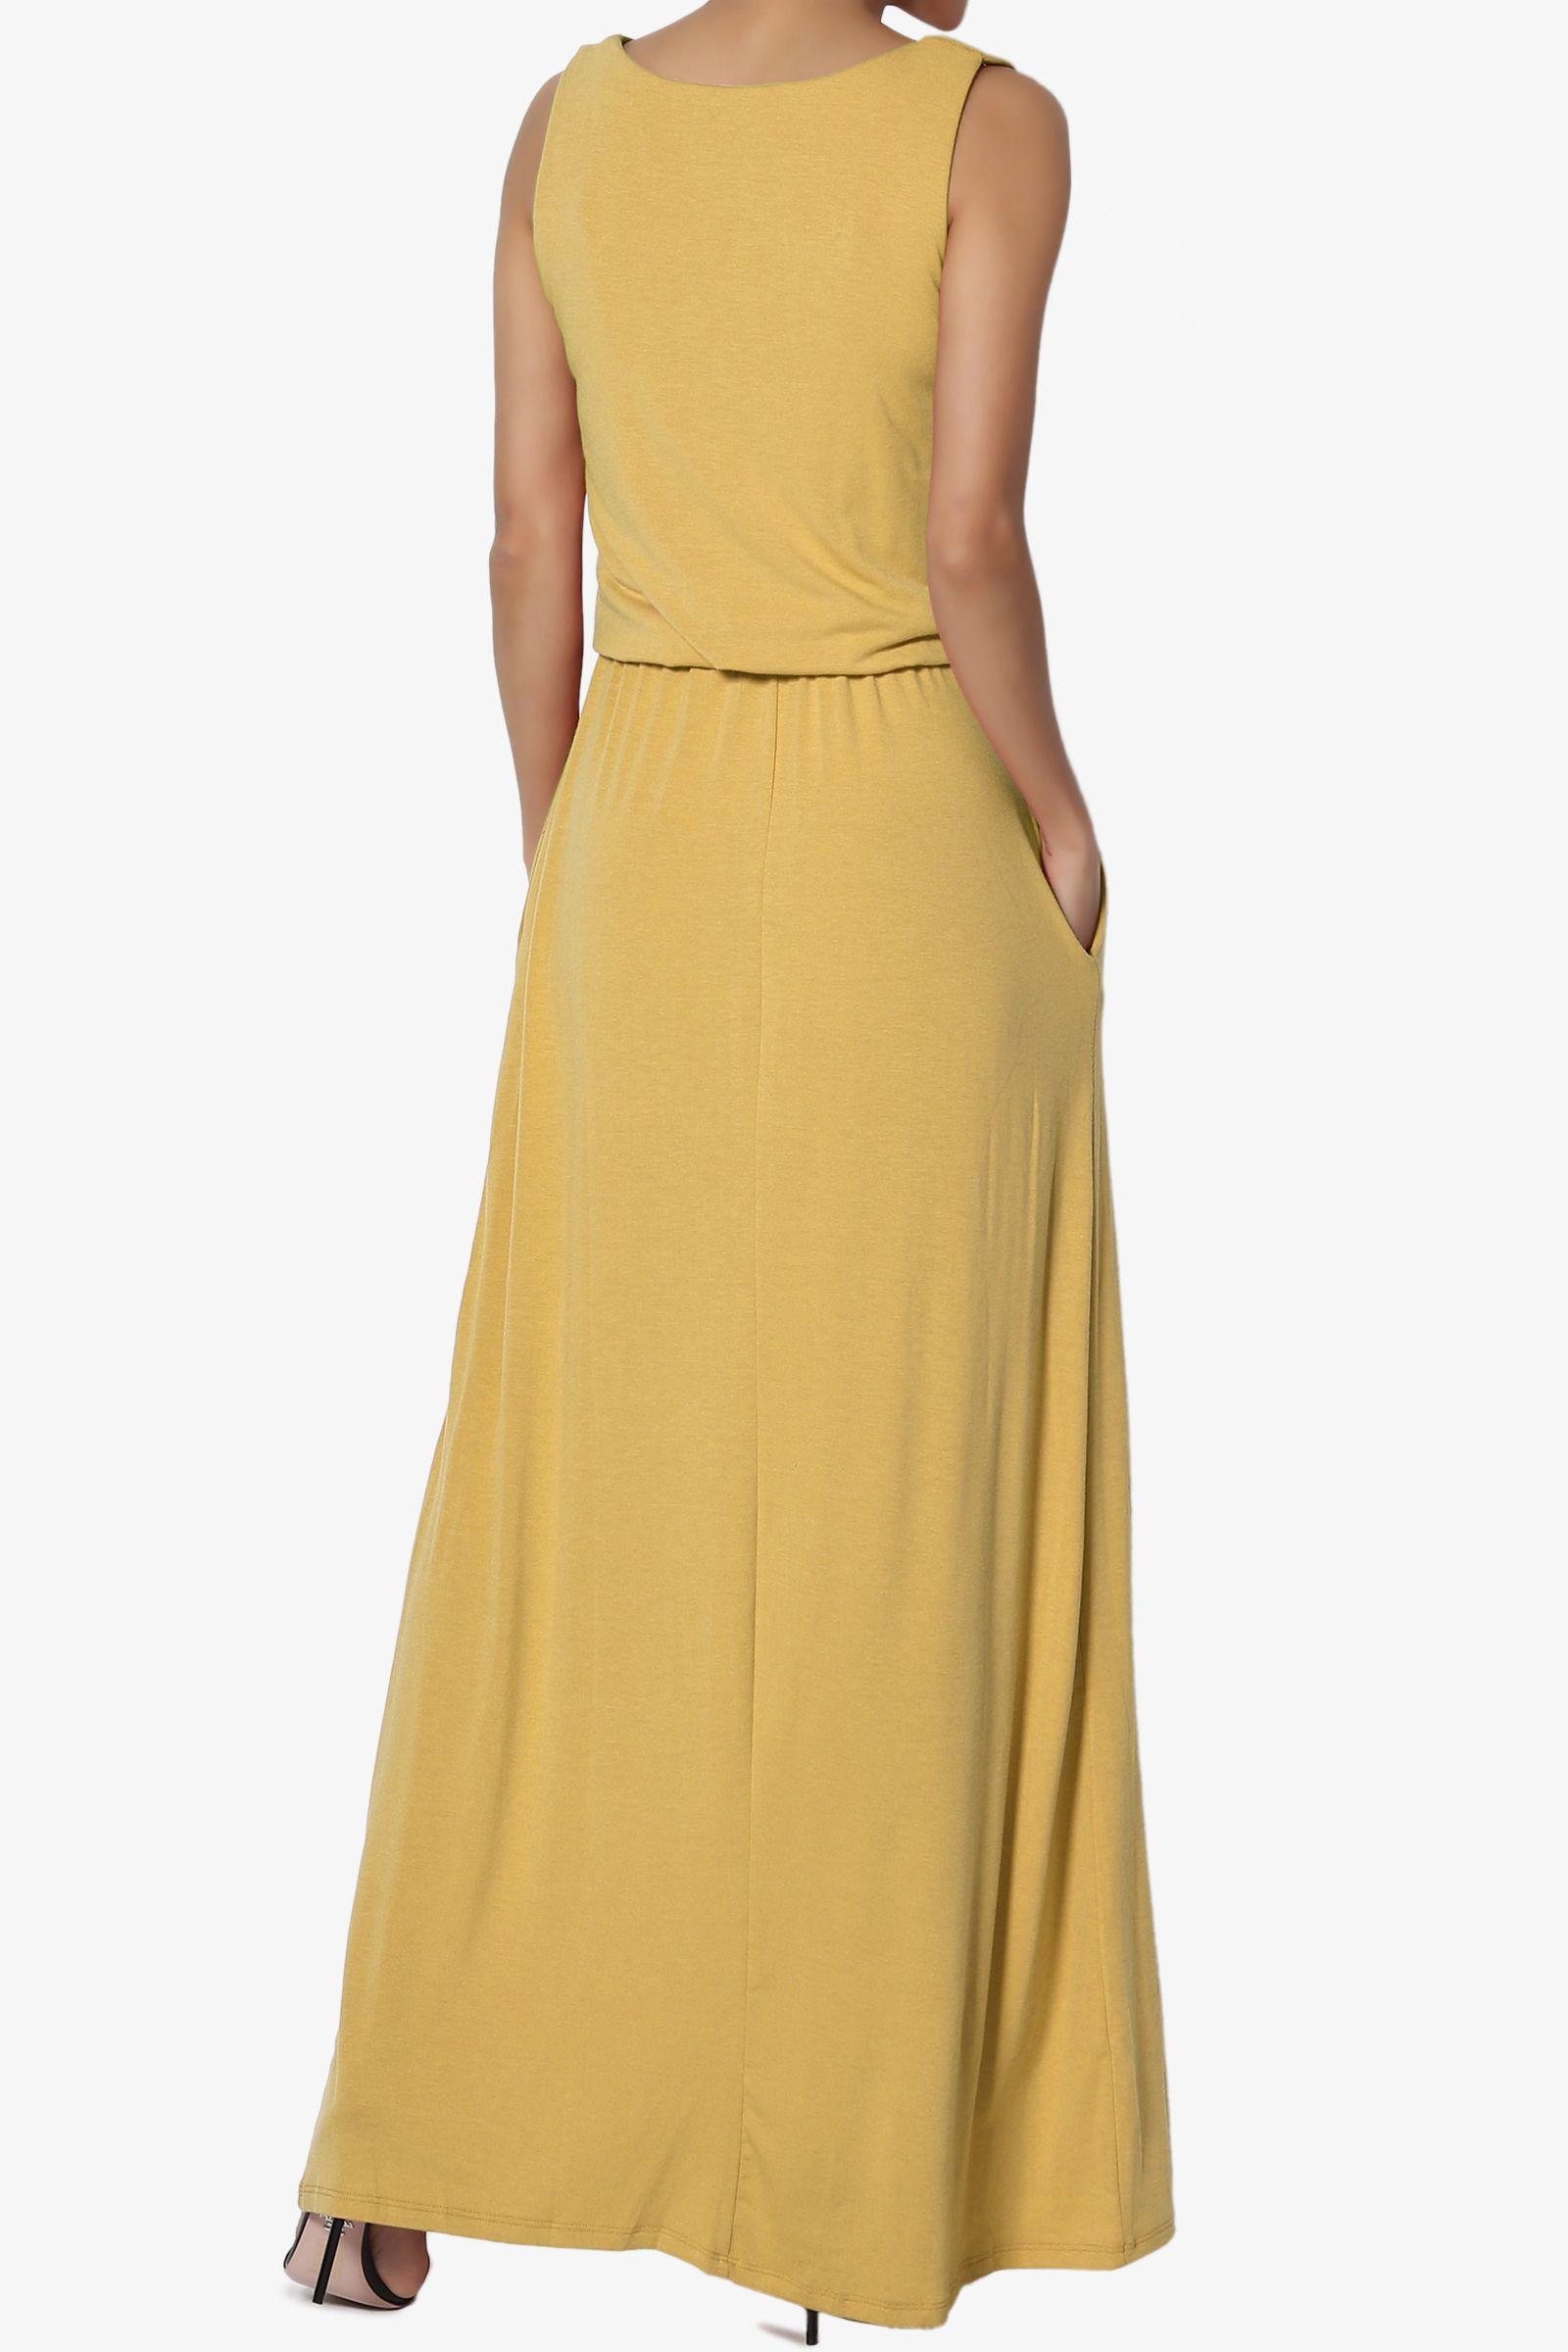 Themogan Themogan Women S S 3x Sleeveless Scoop Neck Blouson Tank Top Long Skirt Maxi Dress Walmart Com Long Skirt Maxi Dress Sleeveless Maxi Dress [ 2400 x 1600 Pixel ]